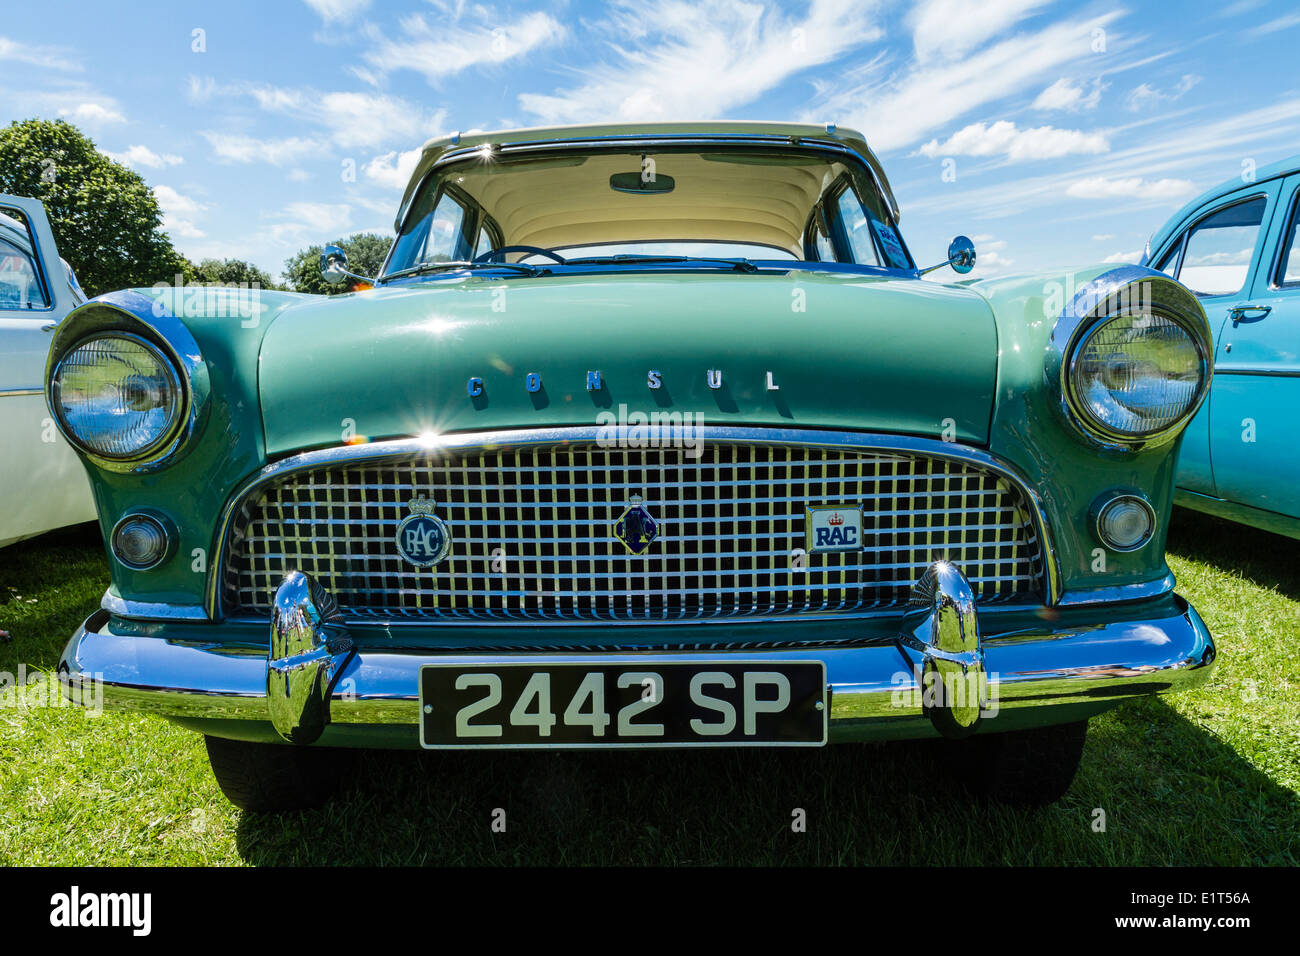 1950 Ford Cónsul en classic car show Imagen De Stock